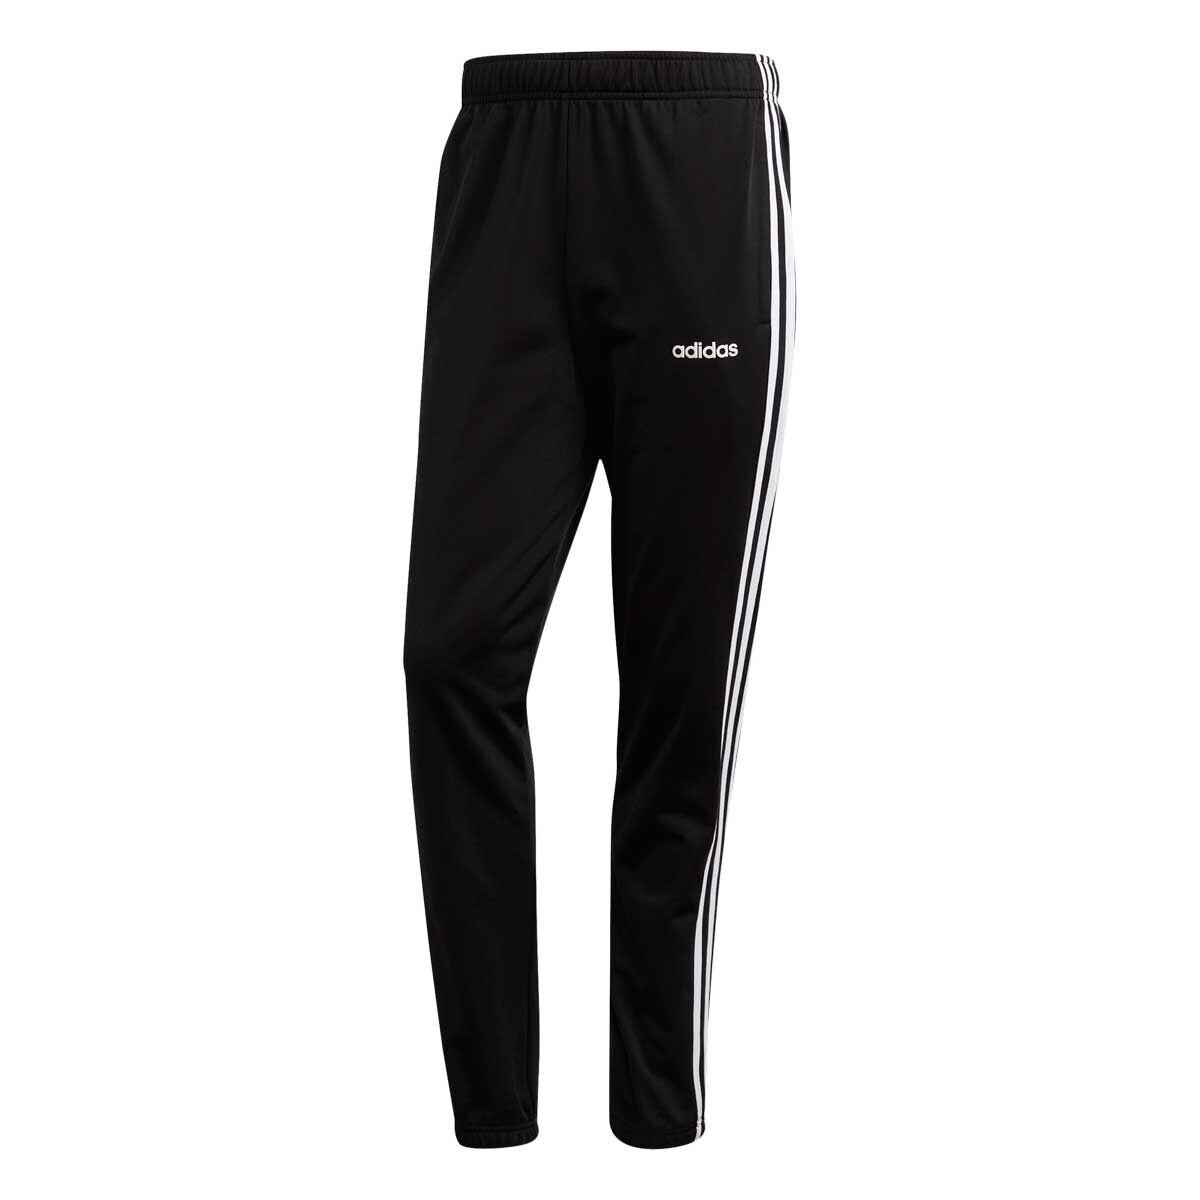 Adidas Men's Essentials 3 Stripe Tapered Tricot Pants